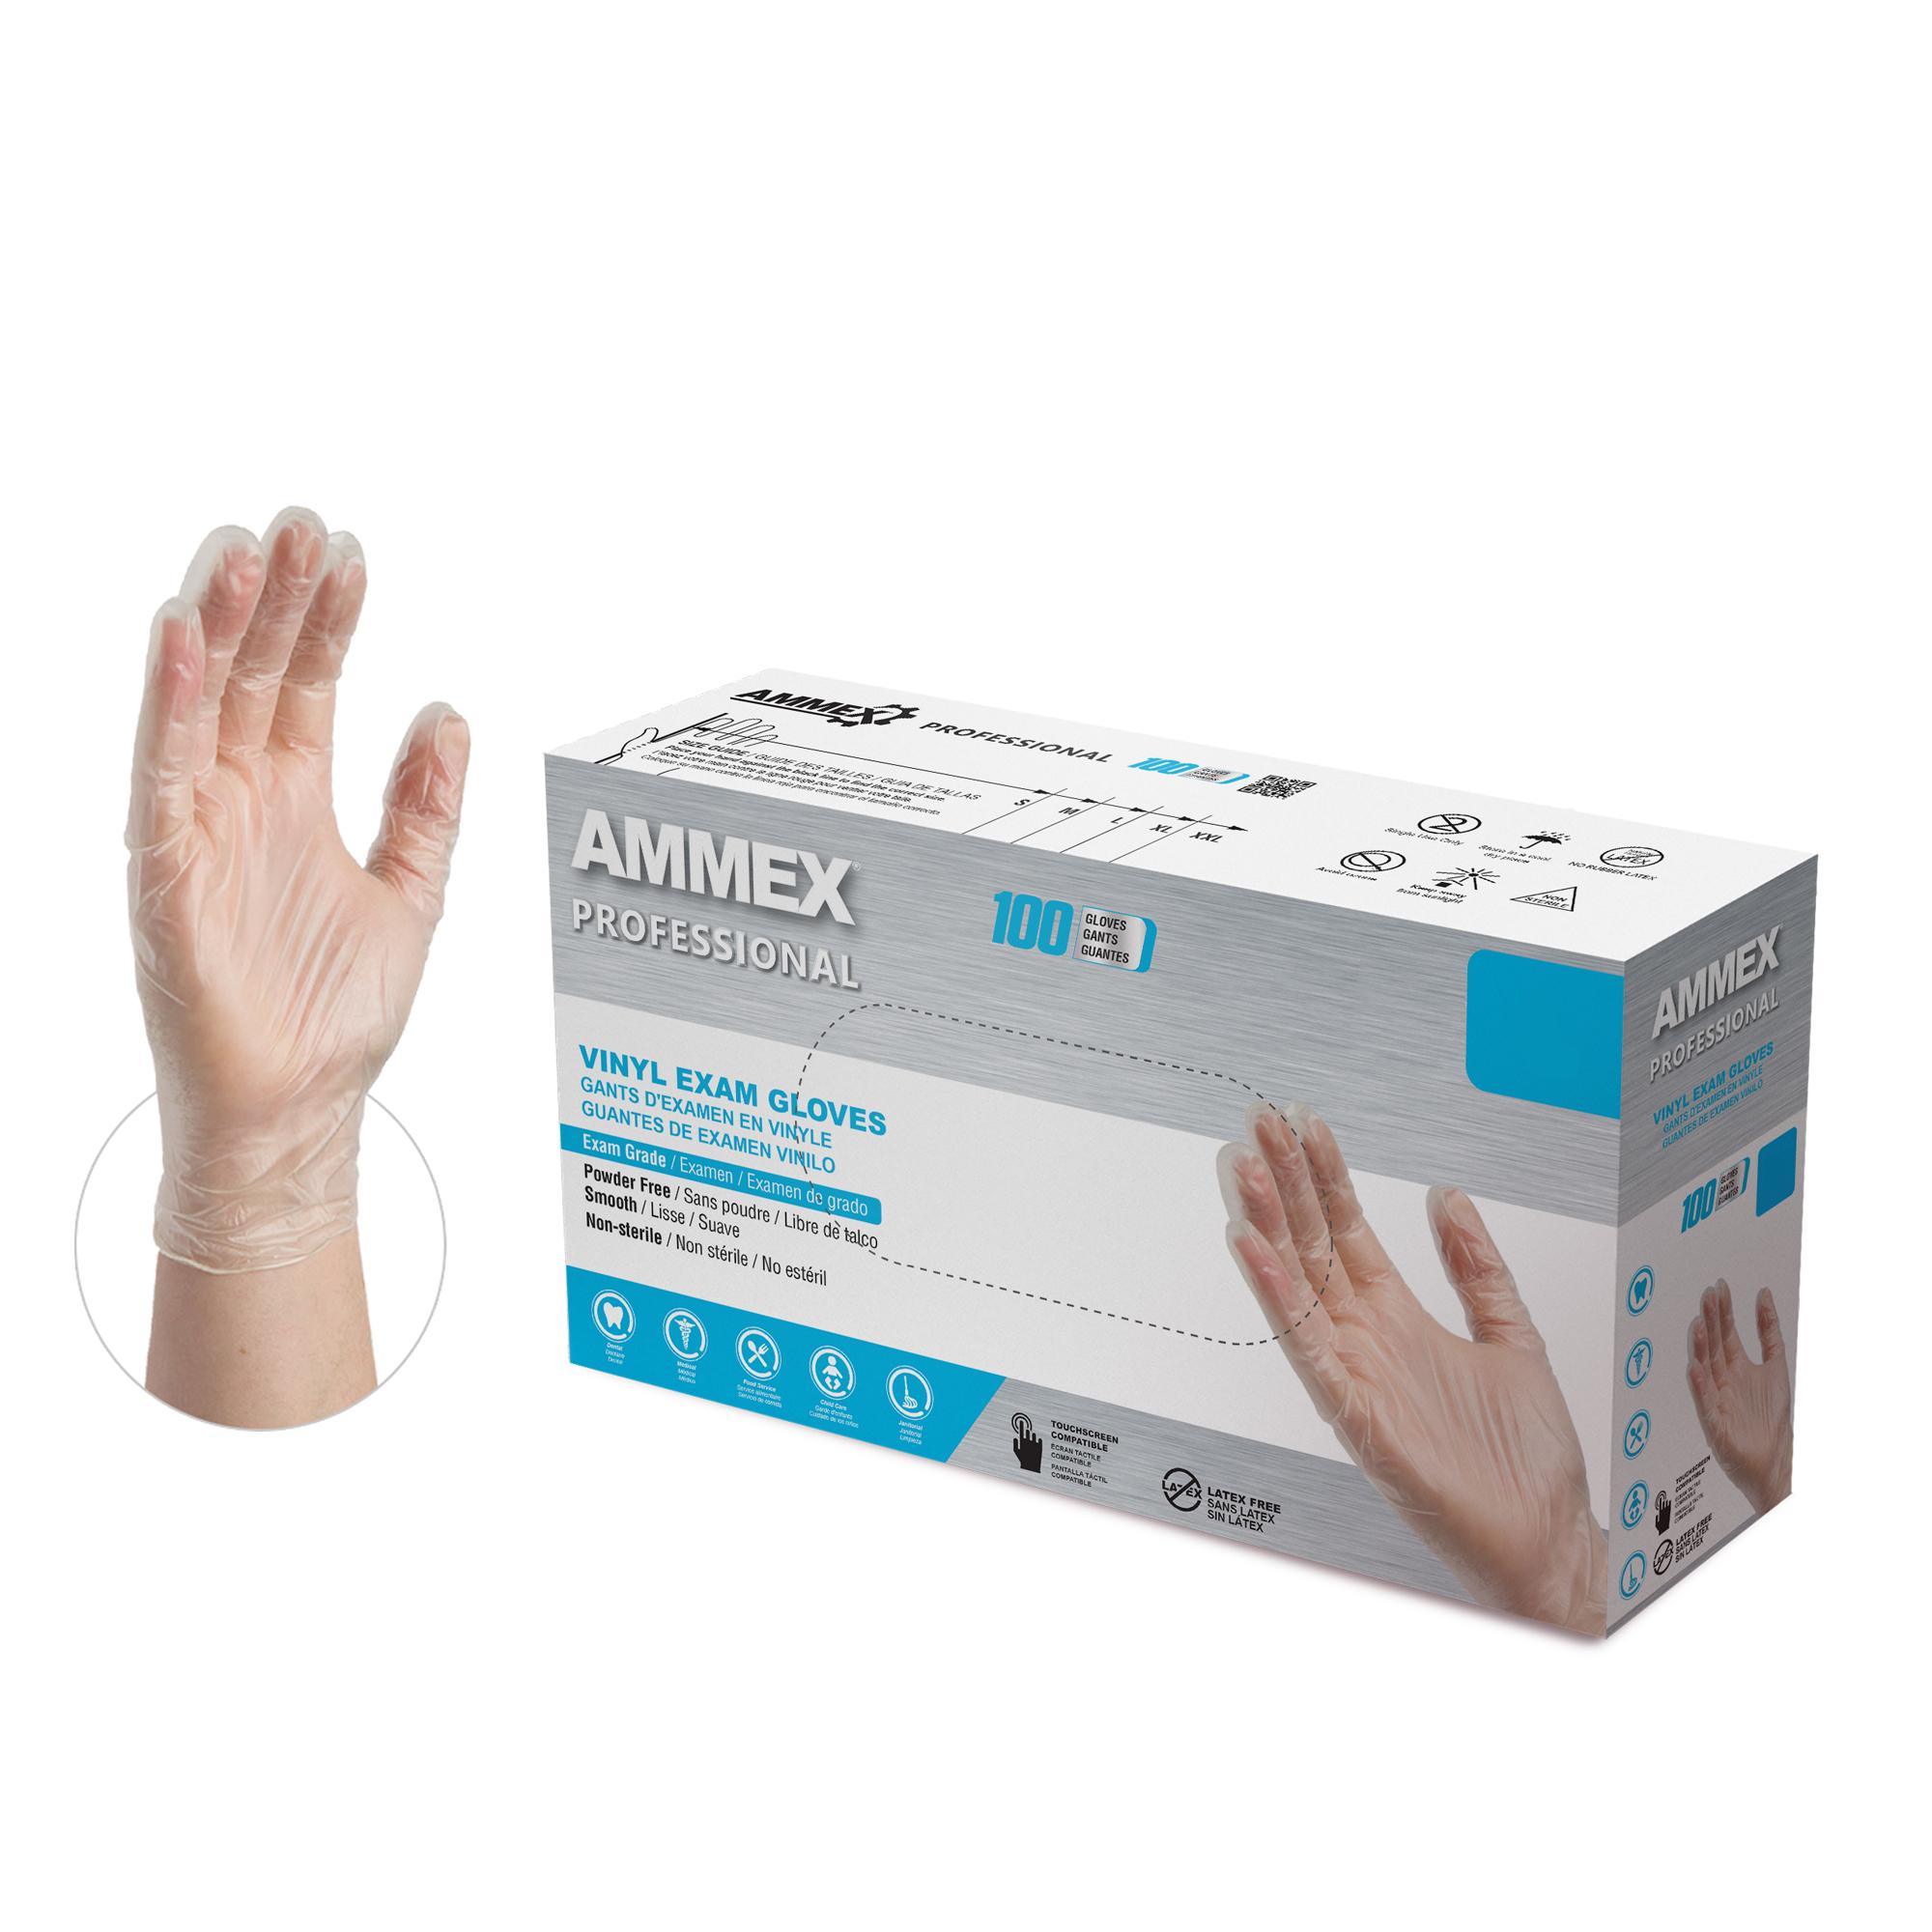 100pcs Vinyl Gloves Synthetic Exam Grade Medium Latex /& Powder free Food Safe